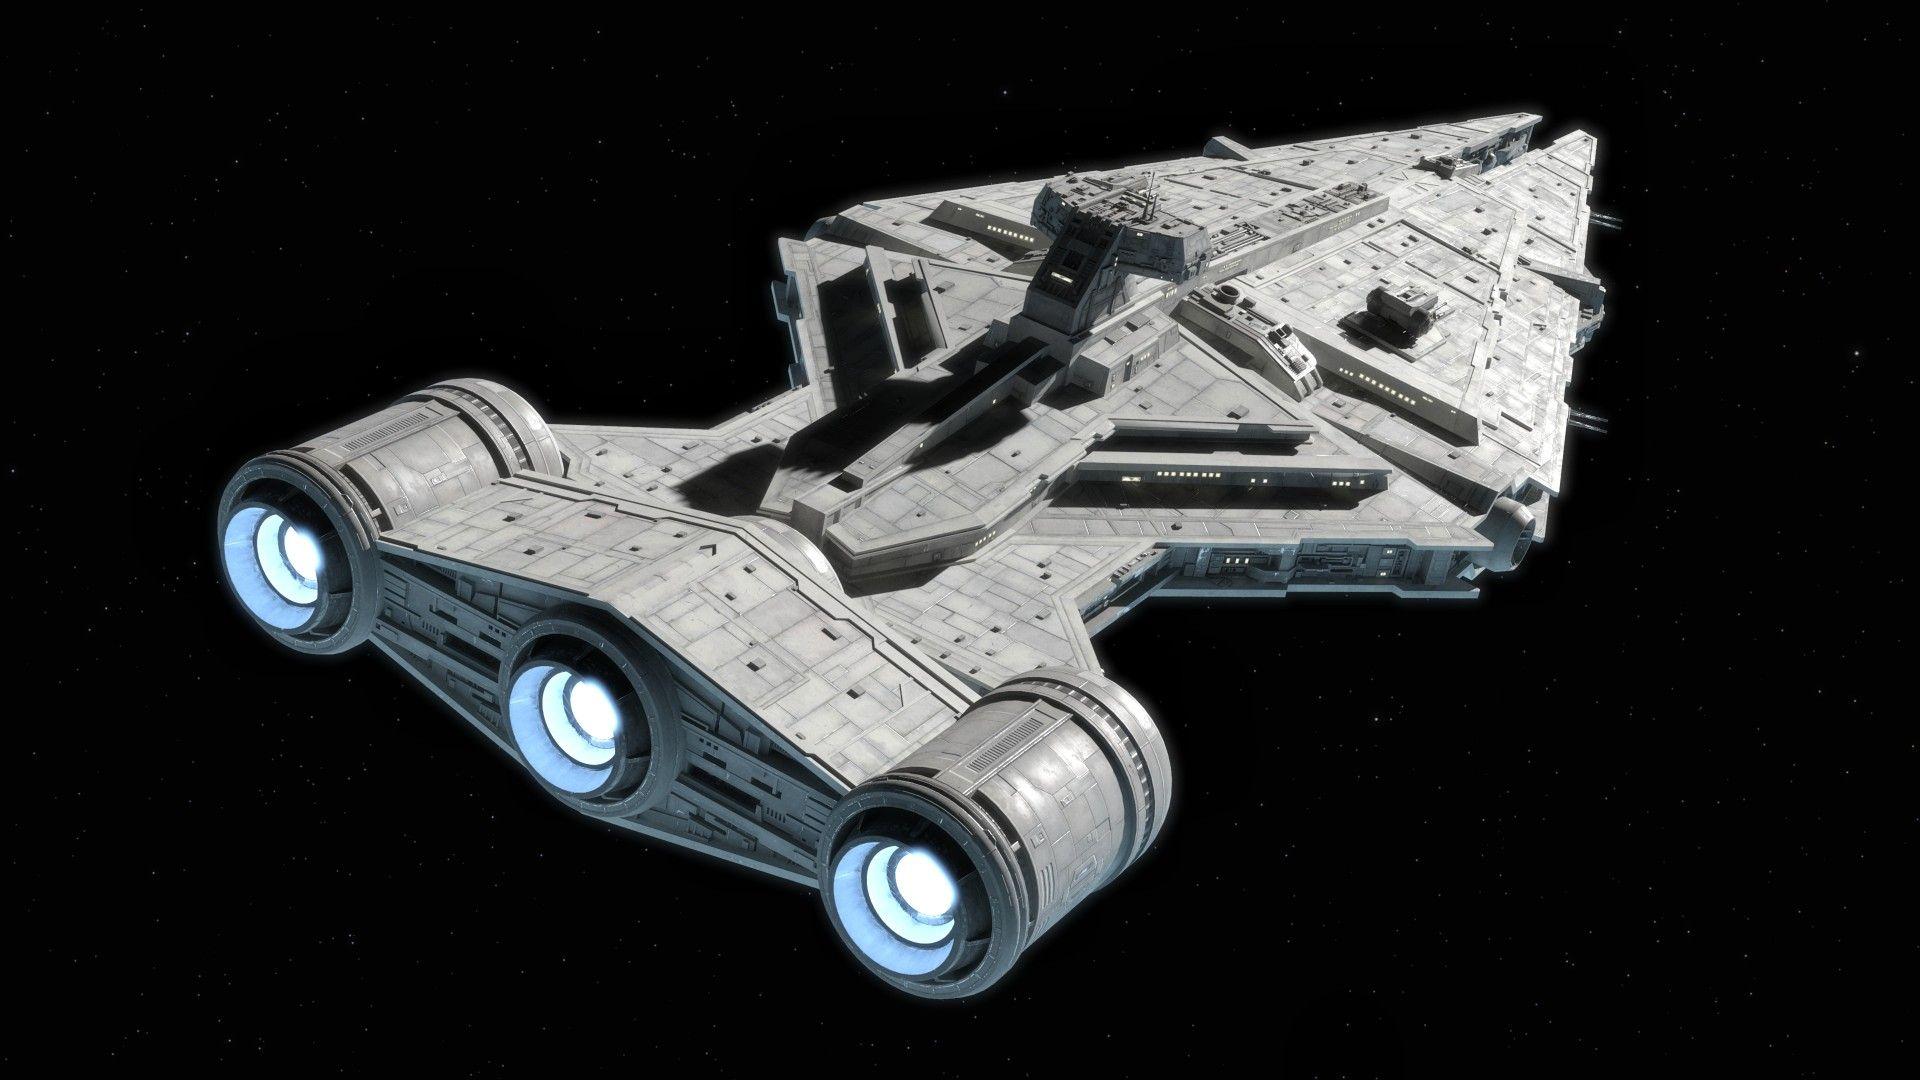 Star Wars Starwars Arquitens Class Light Imperial Cruiser Star